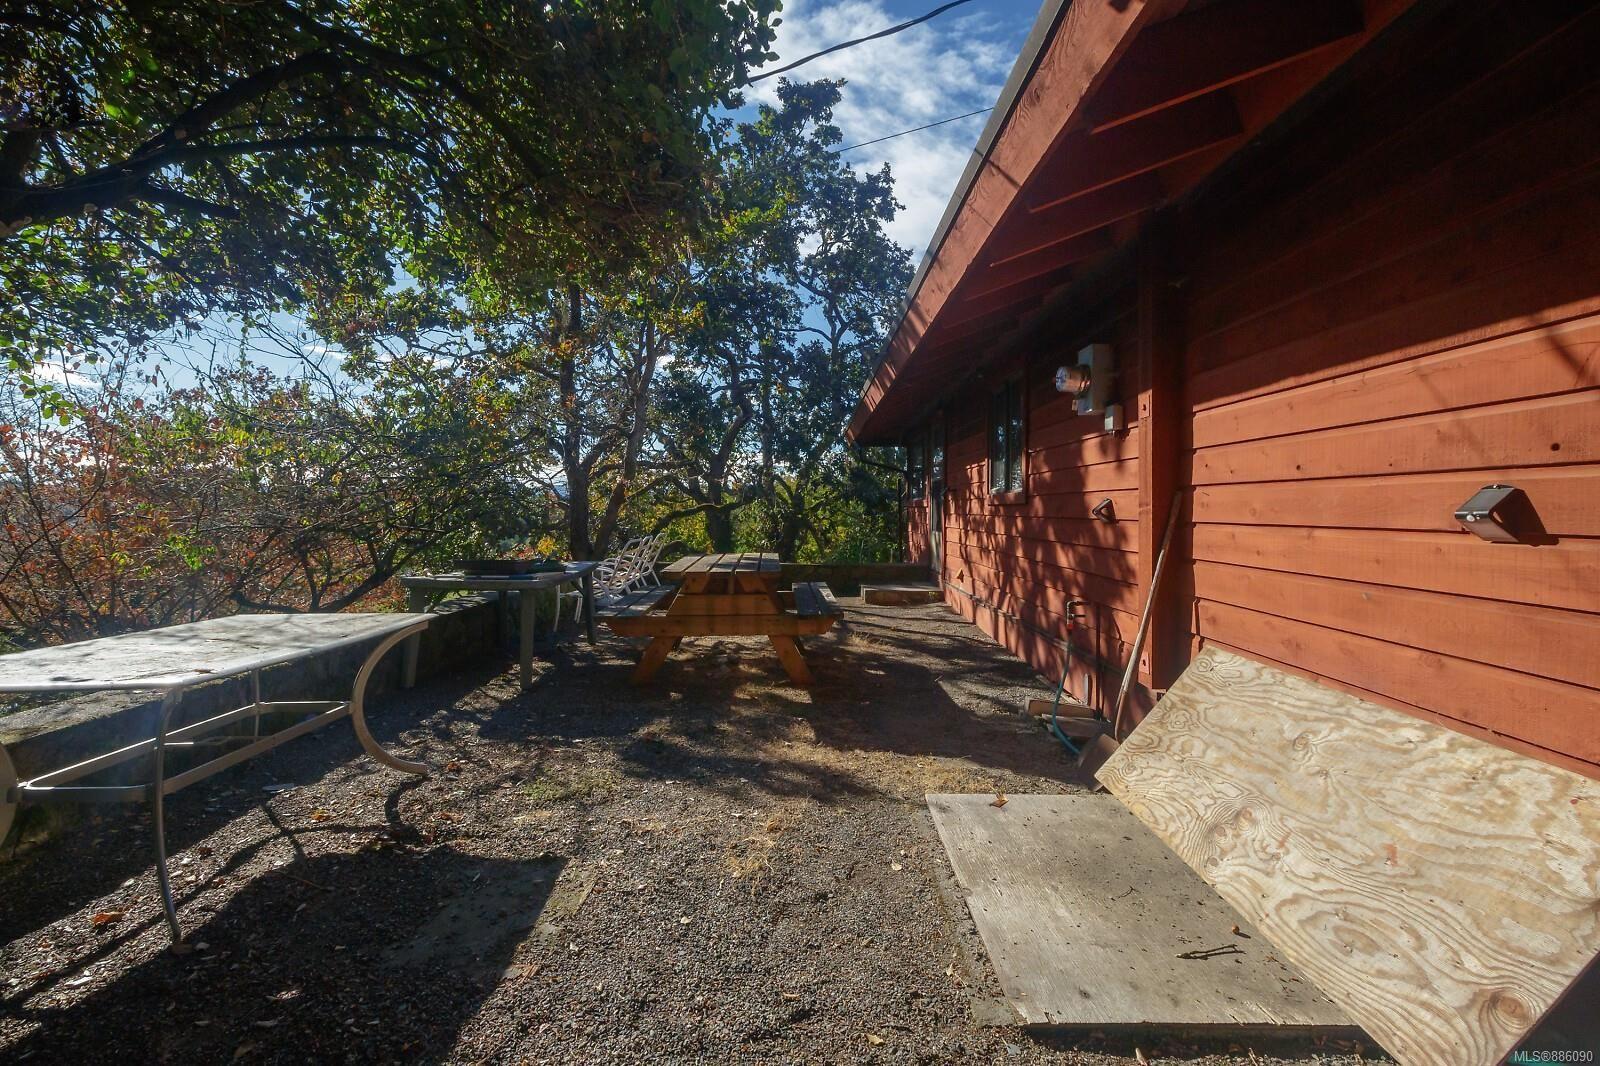 Photo 27: Photos: 4553 Blenkinsop Rd in : SE Blenkinsop House for sale (Saanich East)  : MLS®# 886090